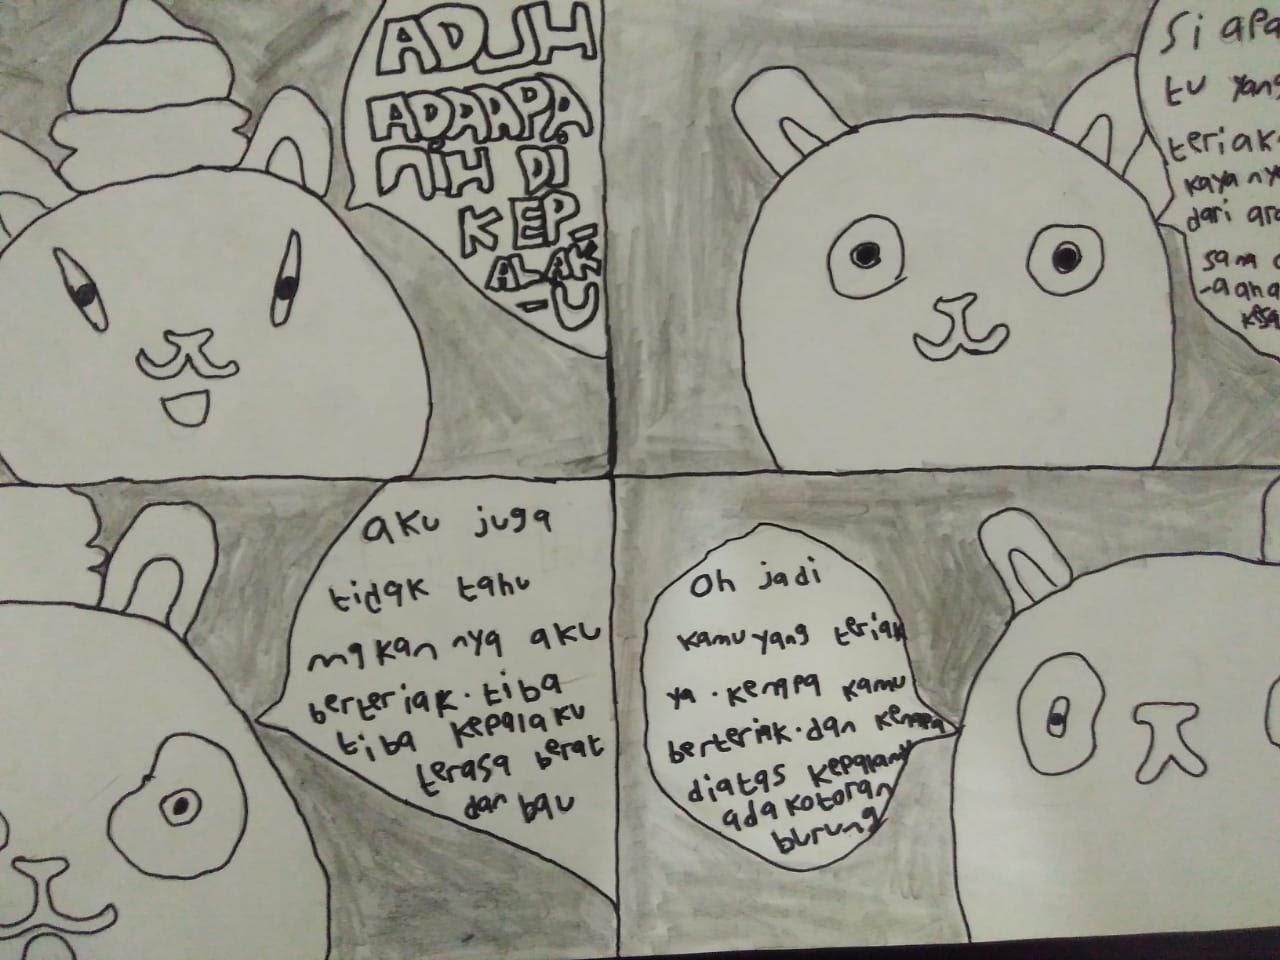 √Contoh Komik yang Menarik Karya Anak Kelas 5 SD - gurune.net